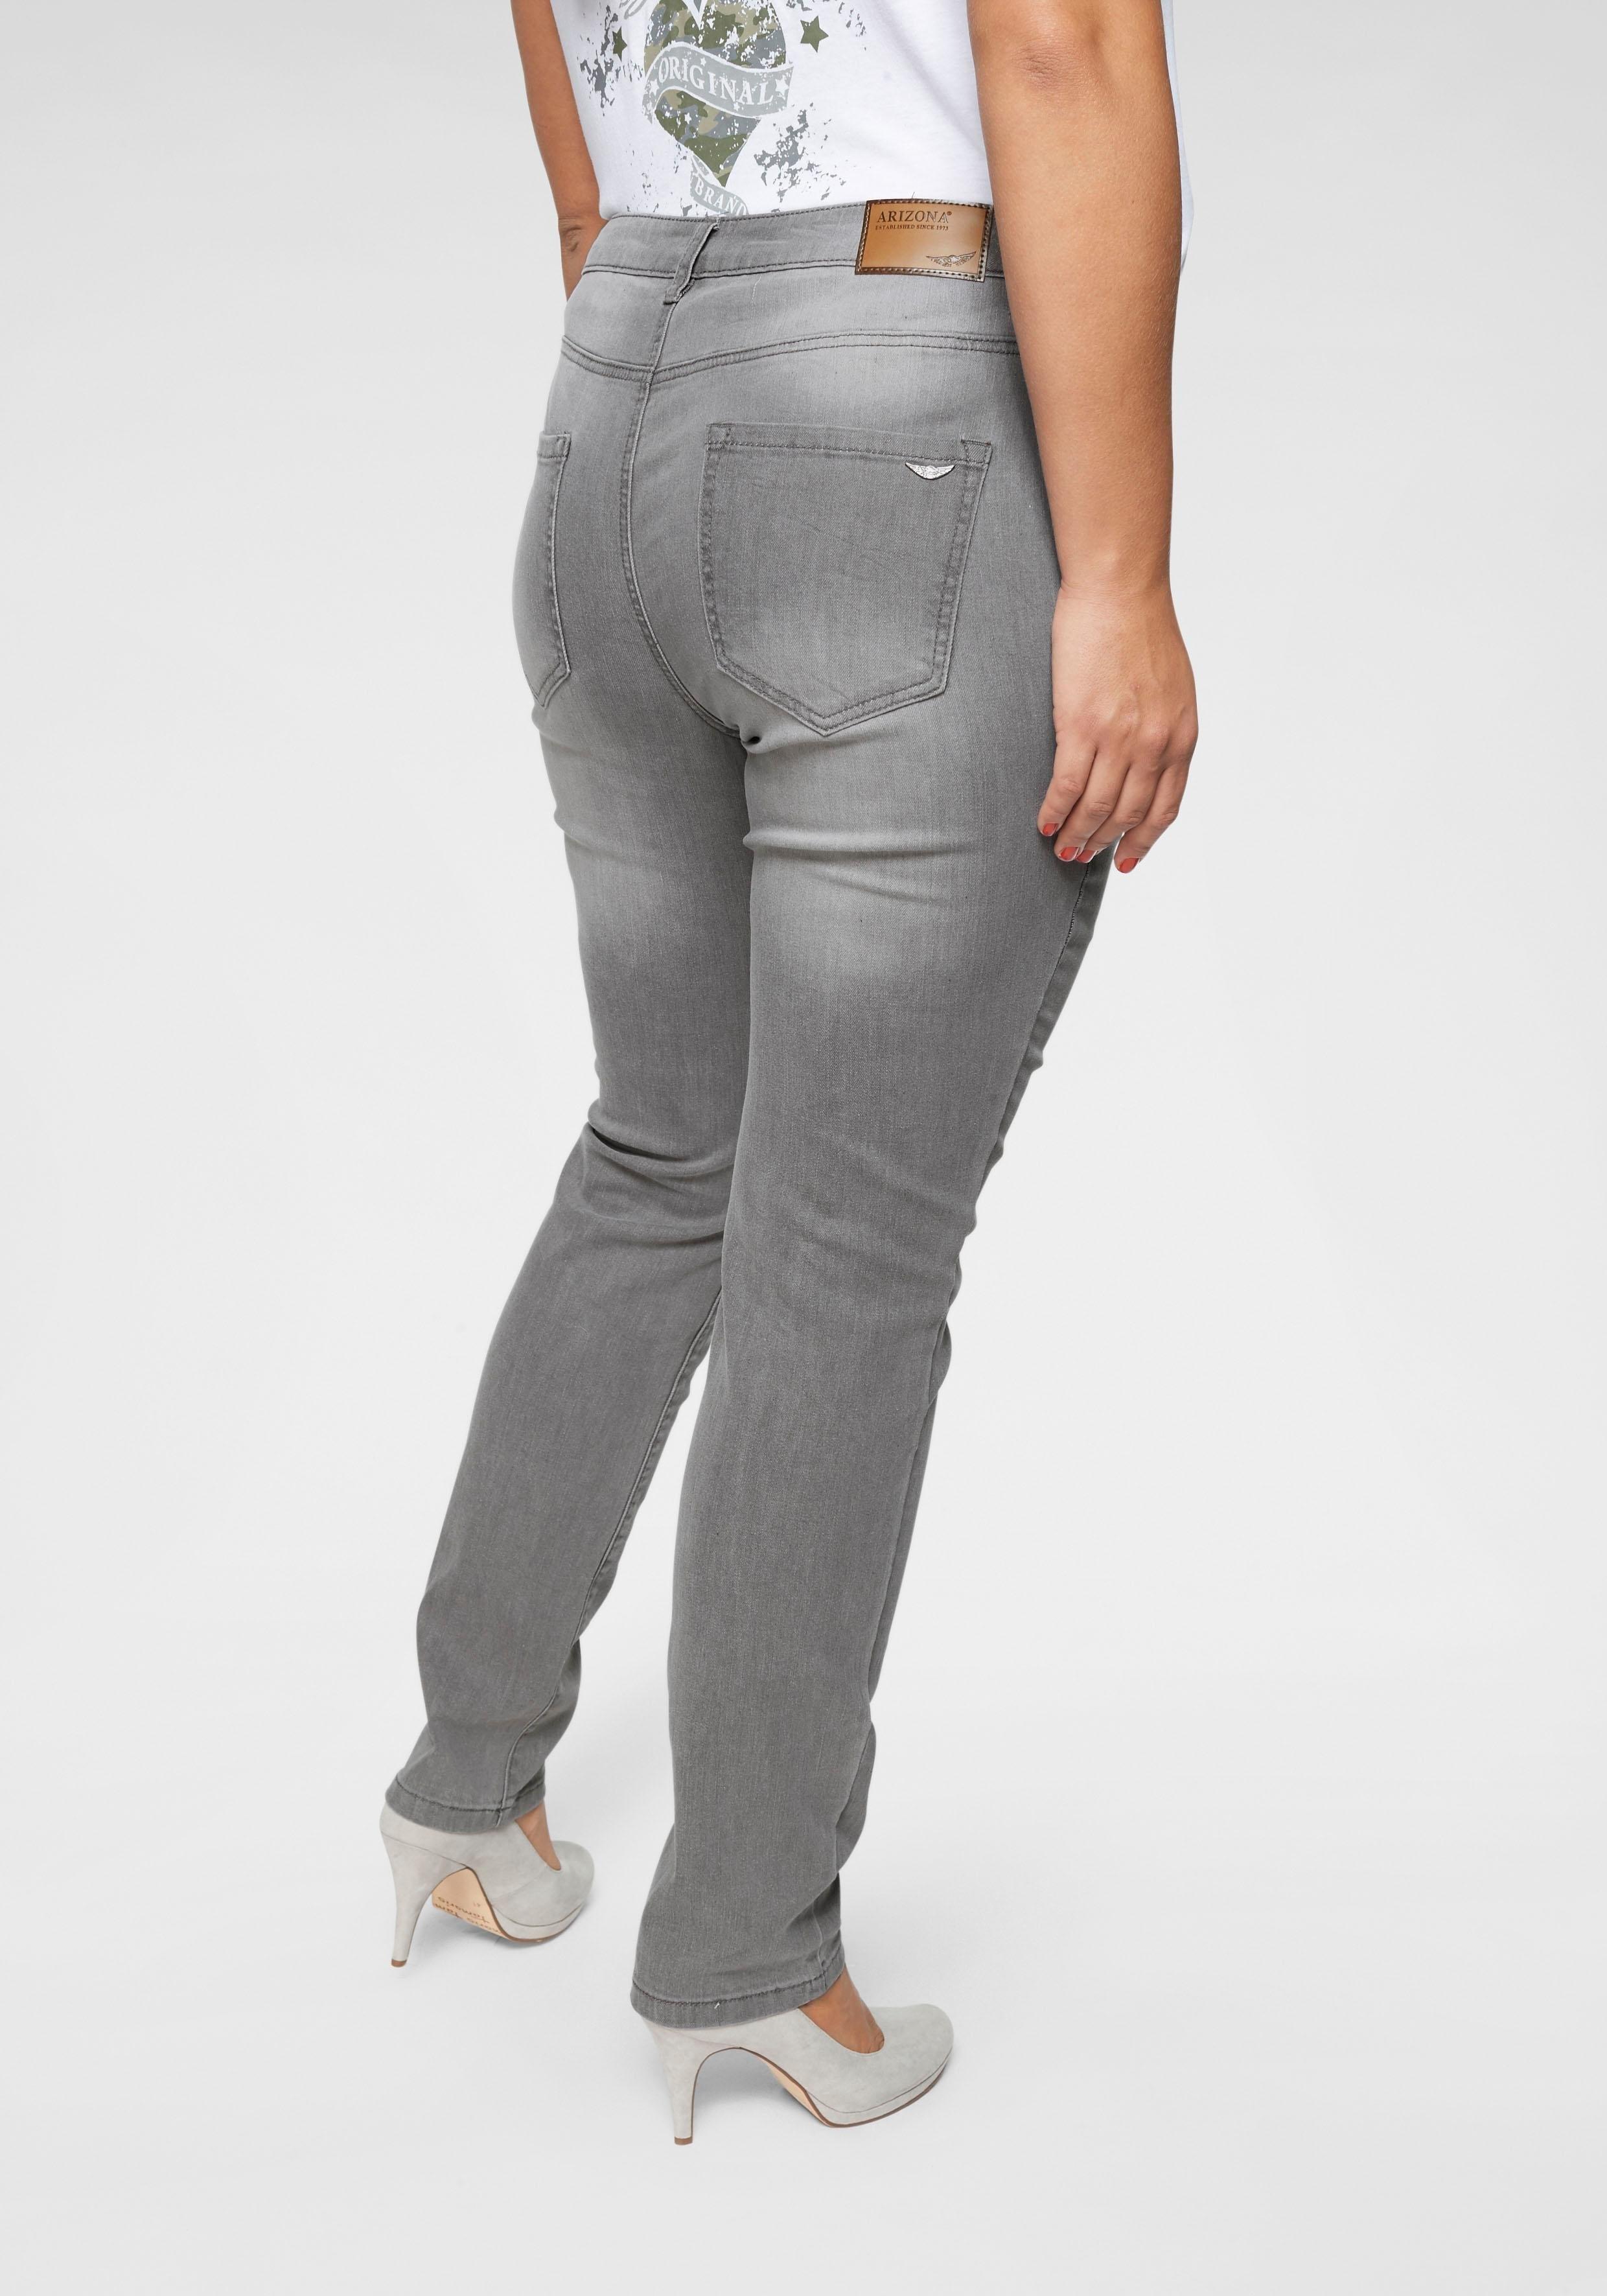 Arizona Slim fit jeans Curve-Collection High Waist online kopen op otto.nl